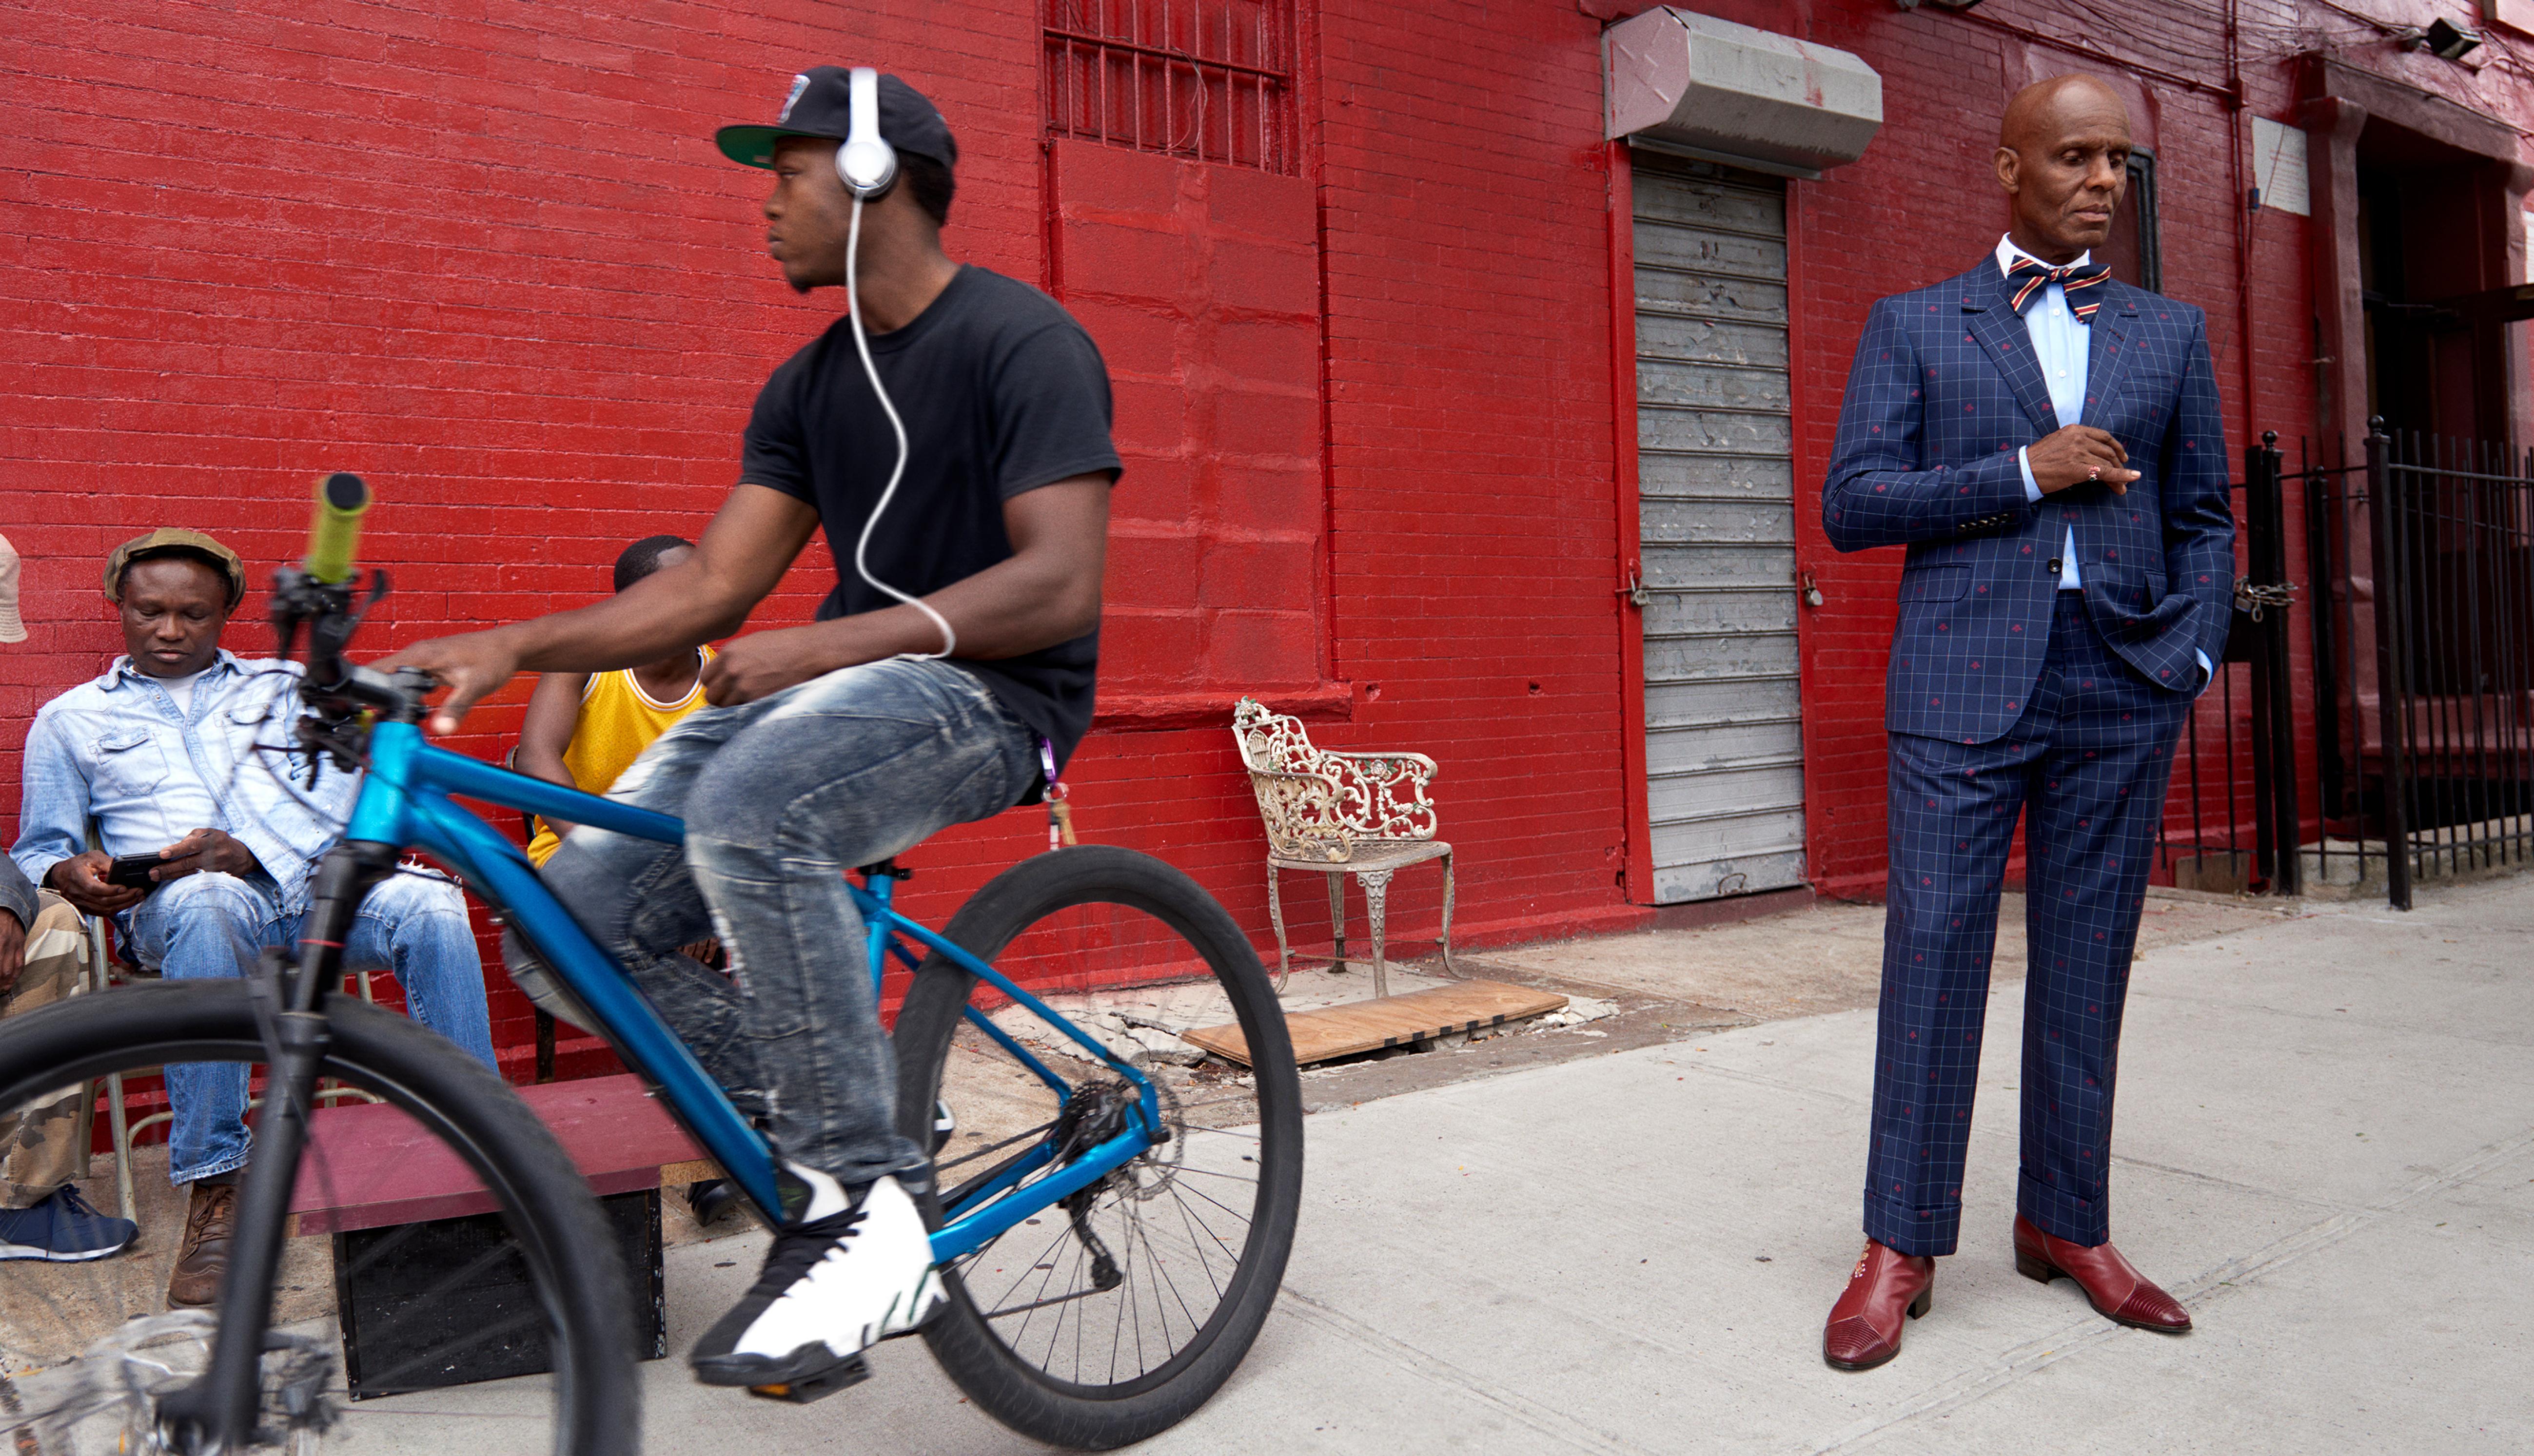 Gucci fall-winter '17 men's tailoring campaign